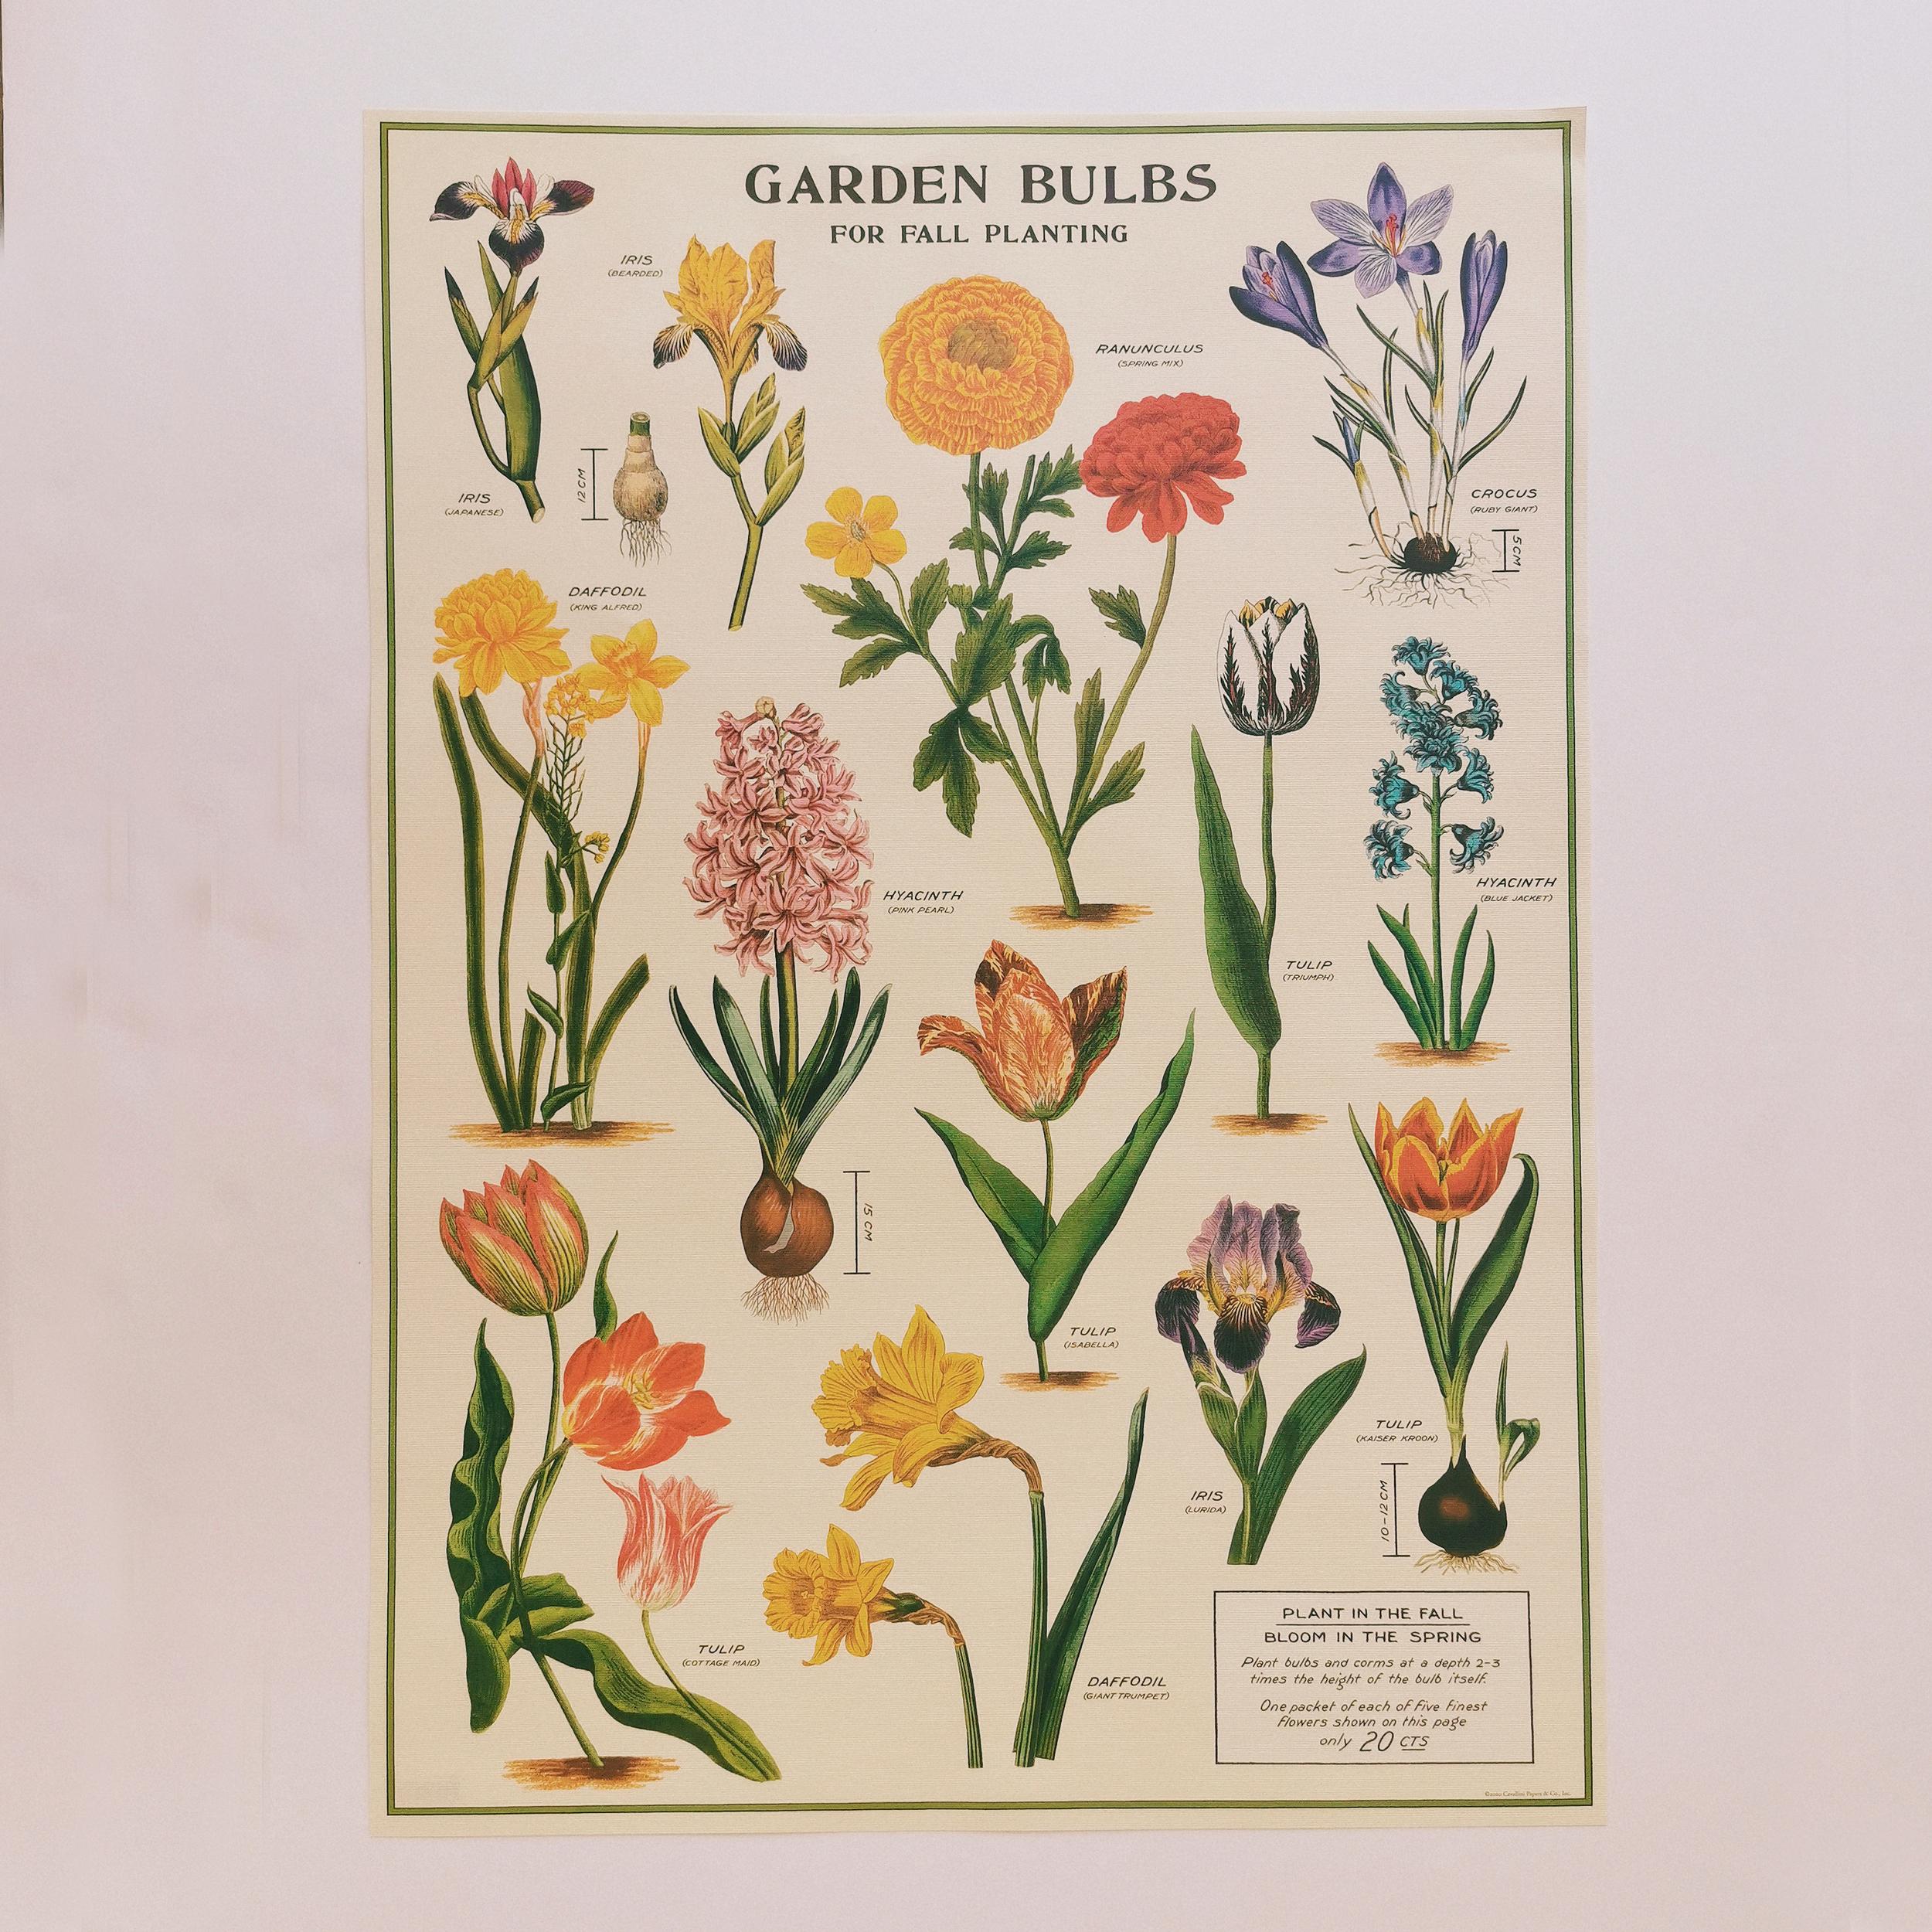 Affiche Jardin de bulbes